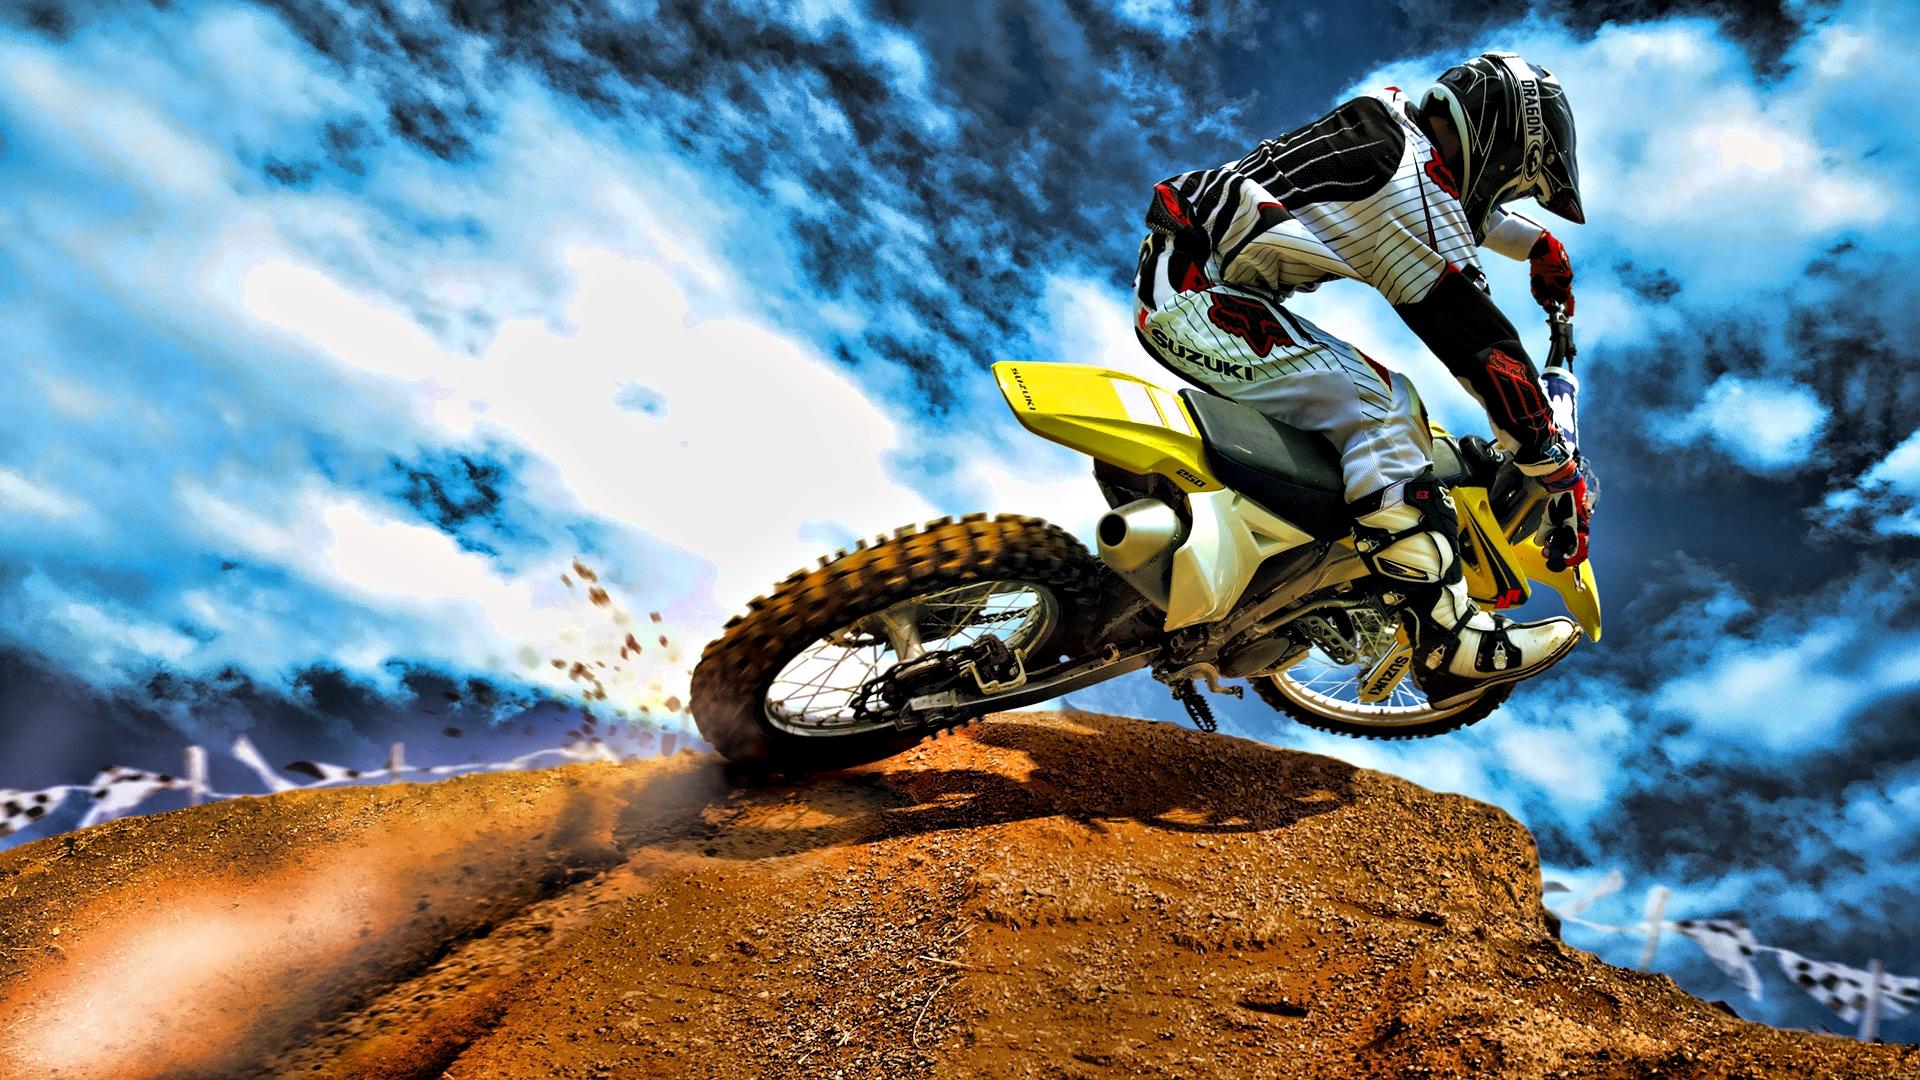 awesome motocross wallpaper 41679